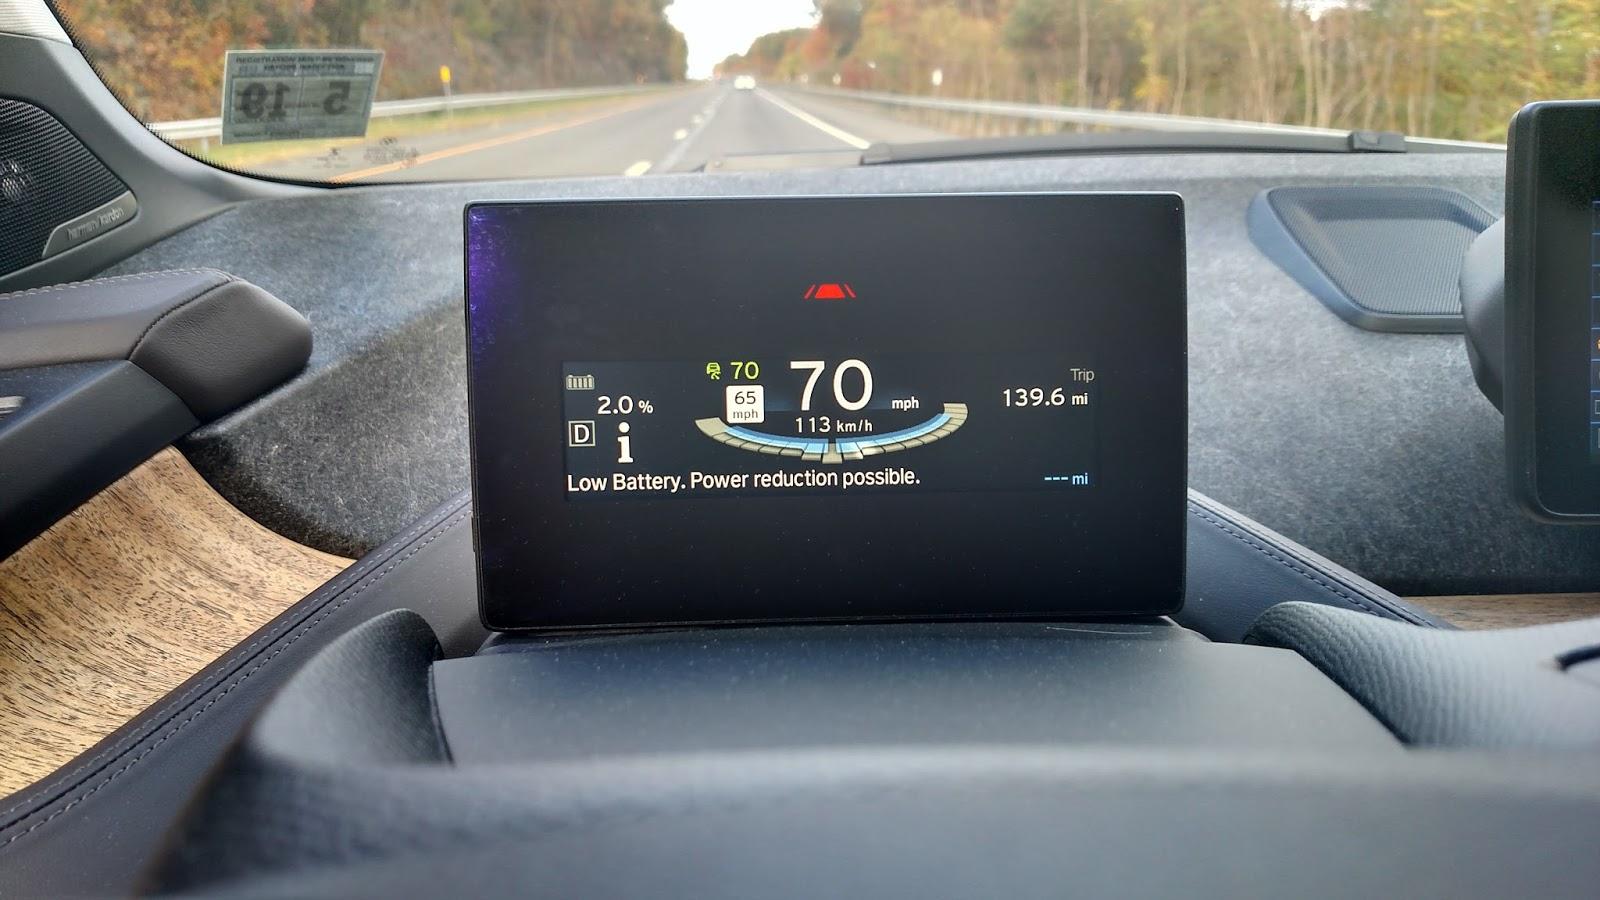 BMW i3 charge state